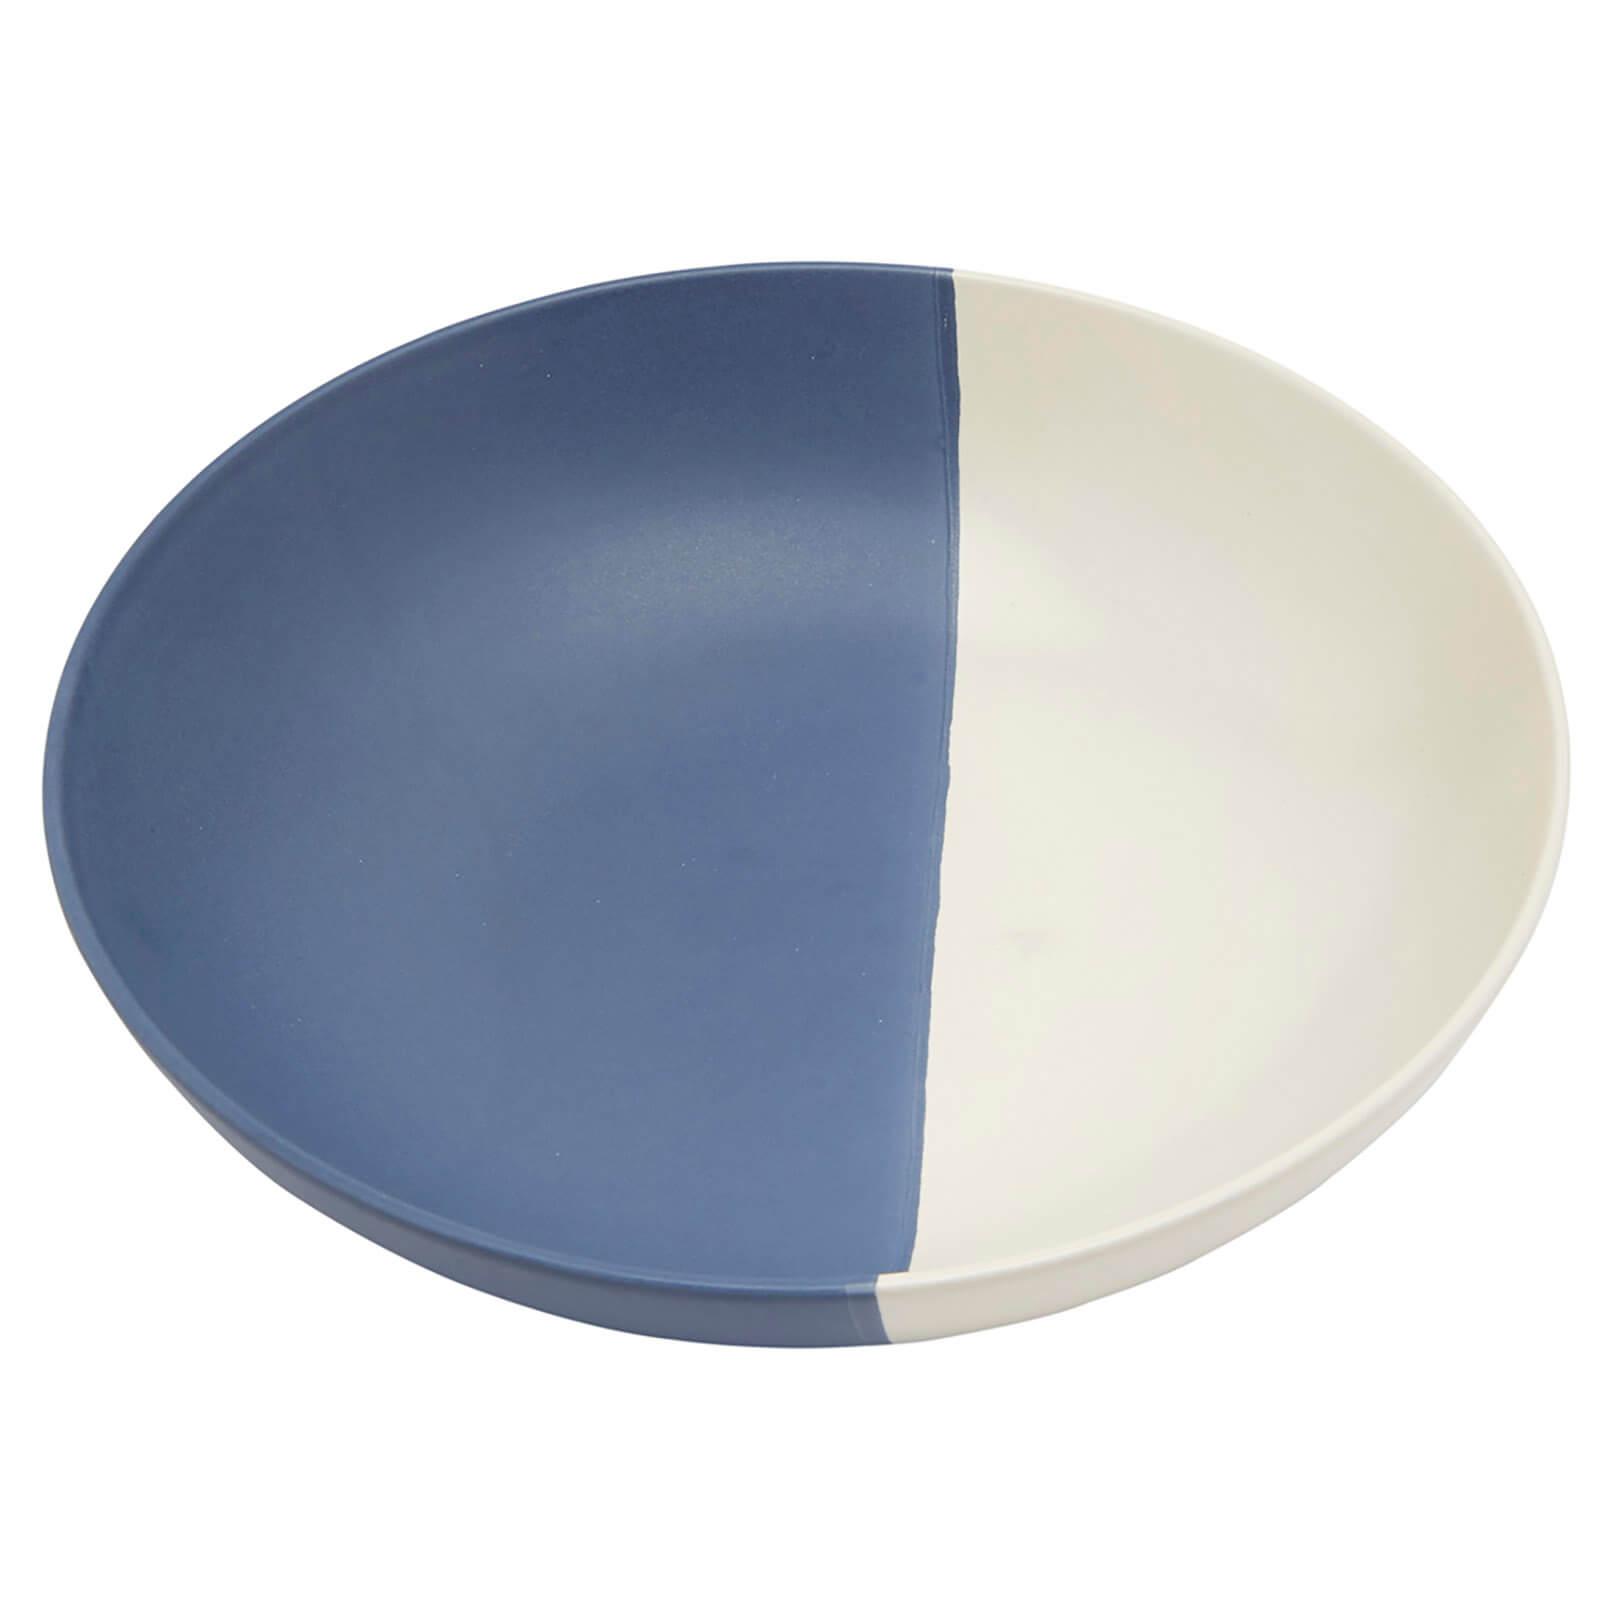 Joules Stoneware Pasta Bowl - French Navy